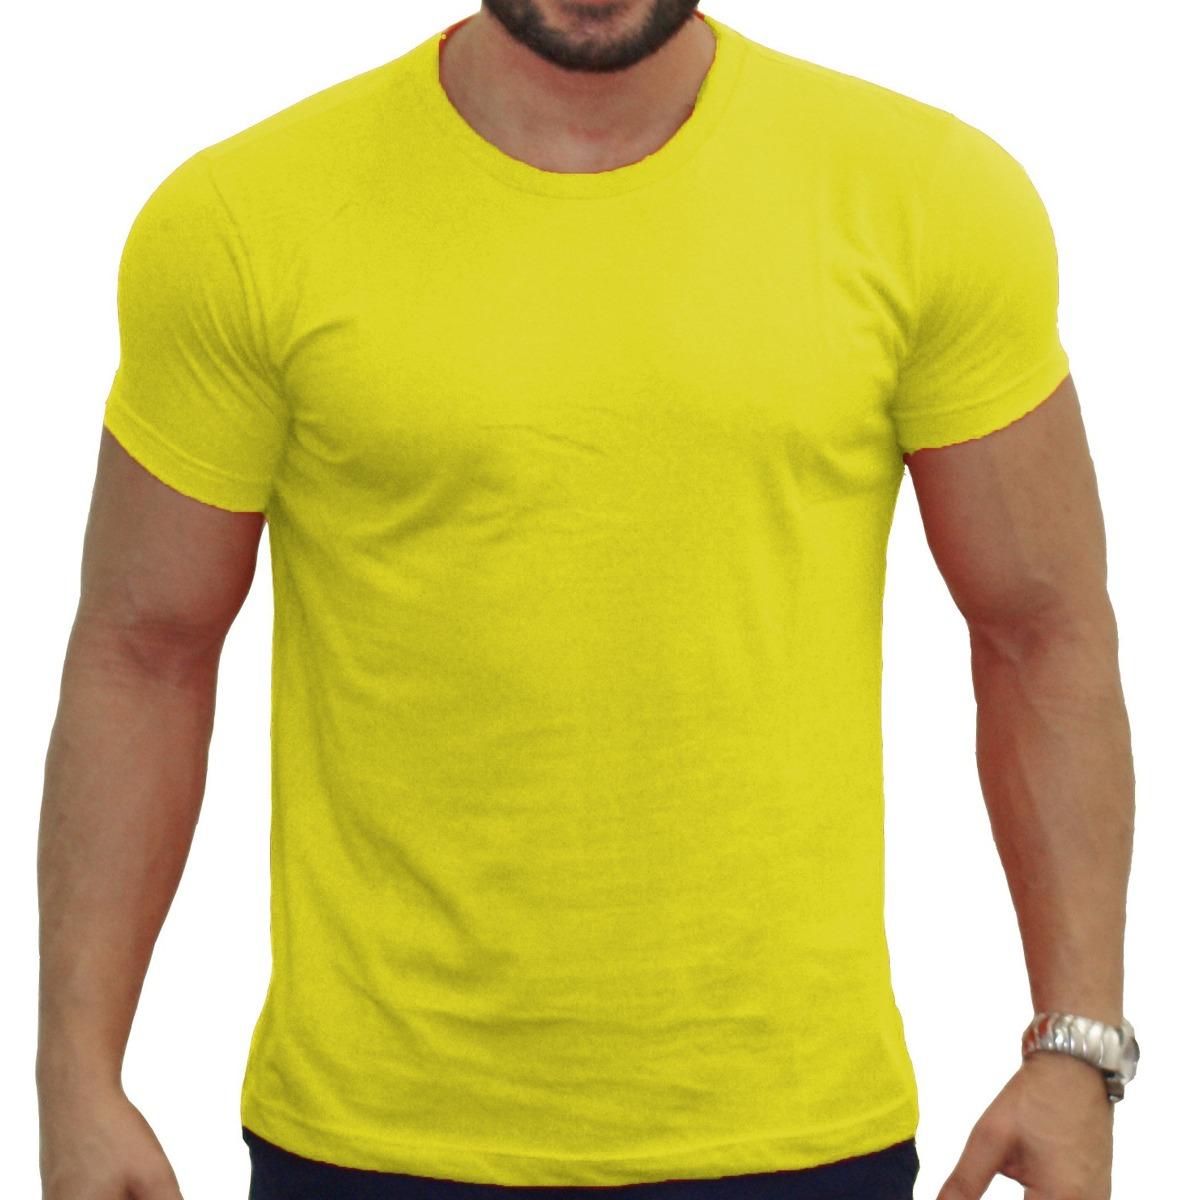 70e497ed4 camisa masculina amarela lisa marca empório colombo. Carregando zoom.